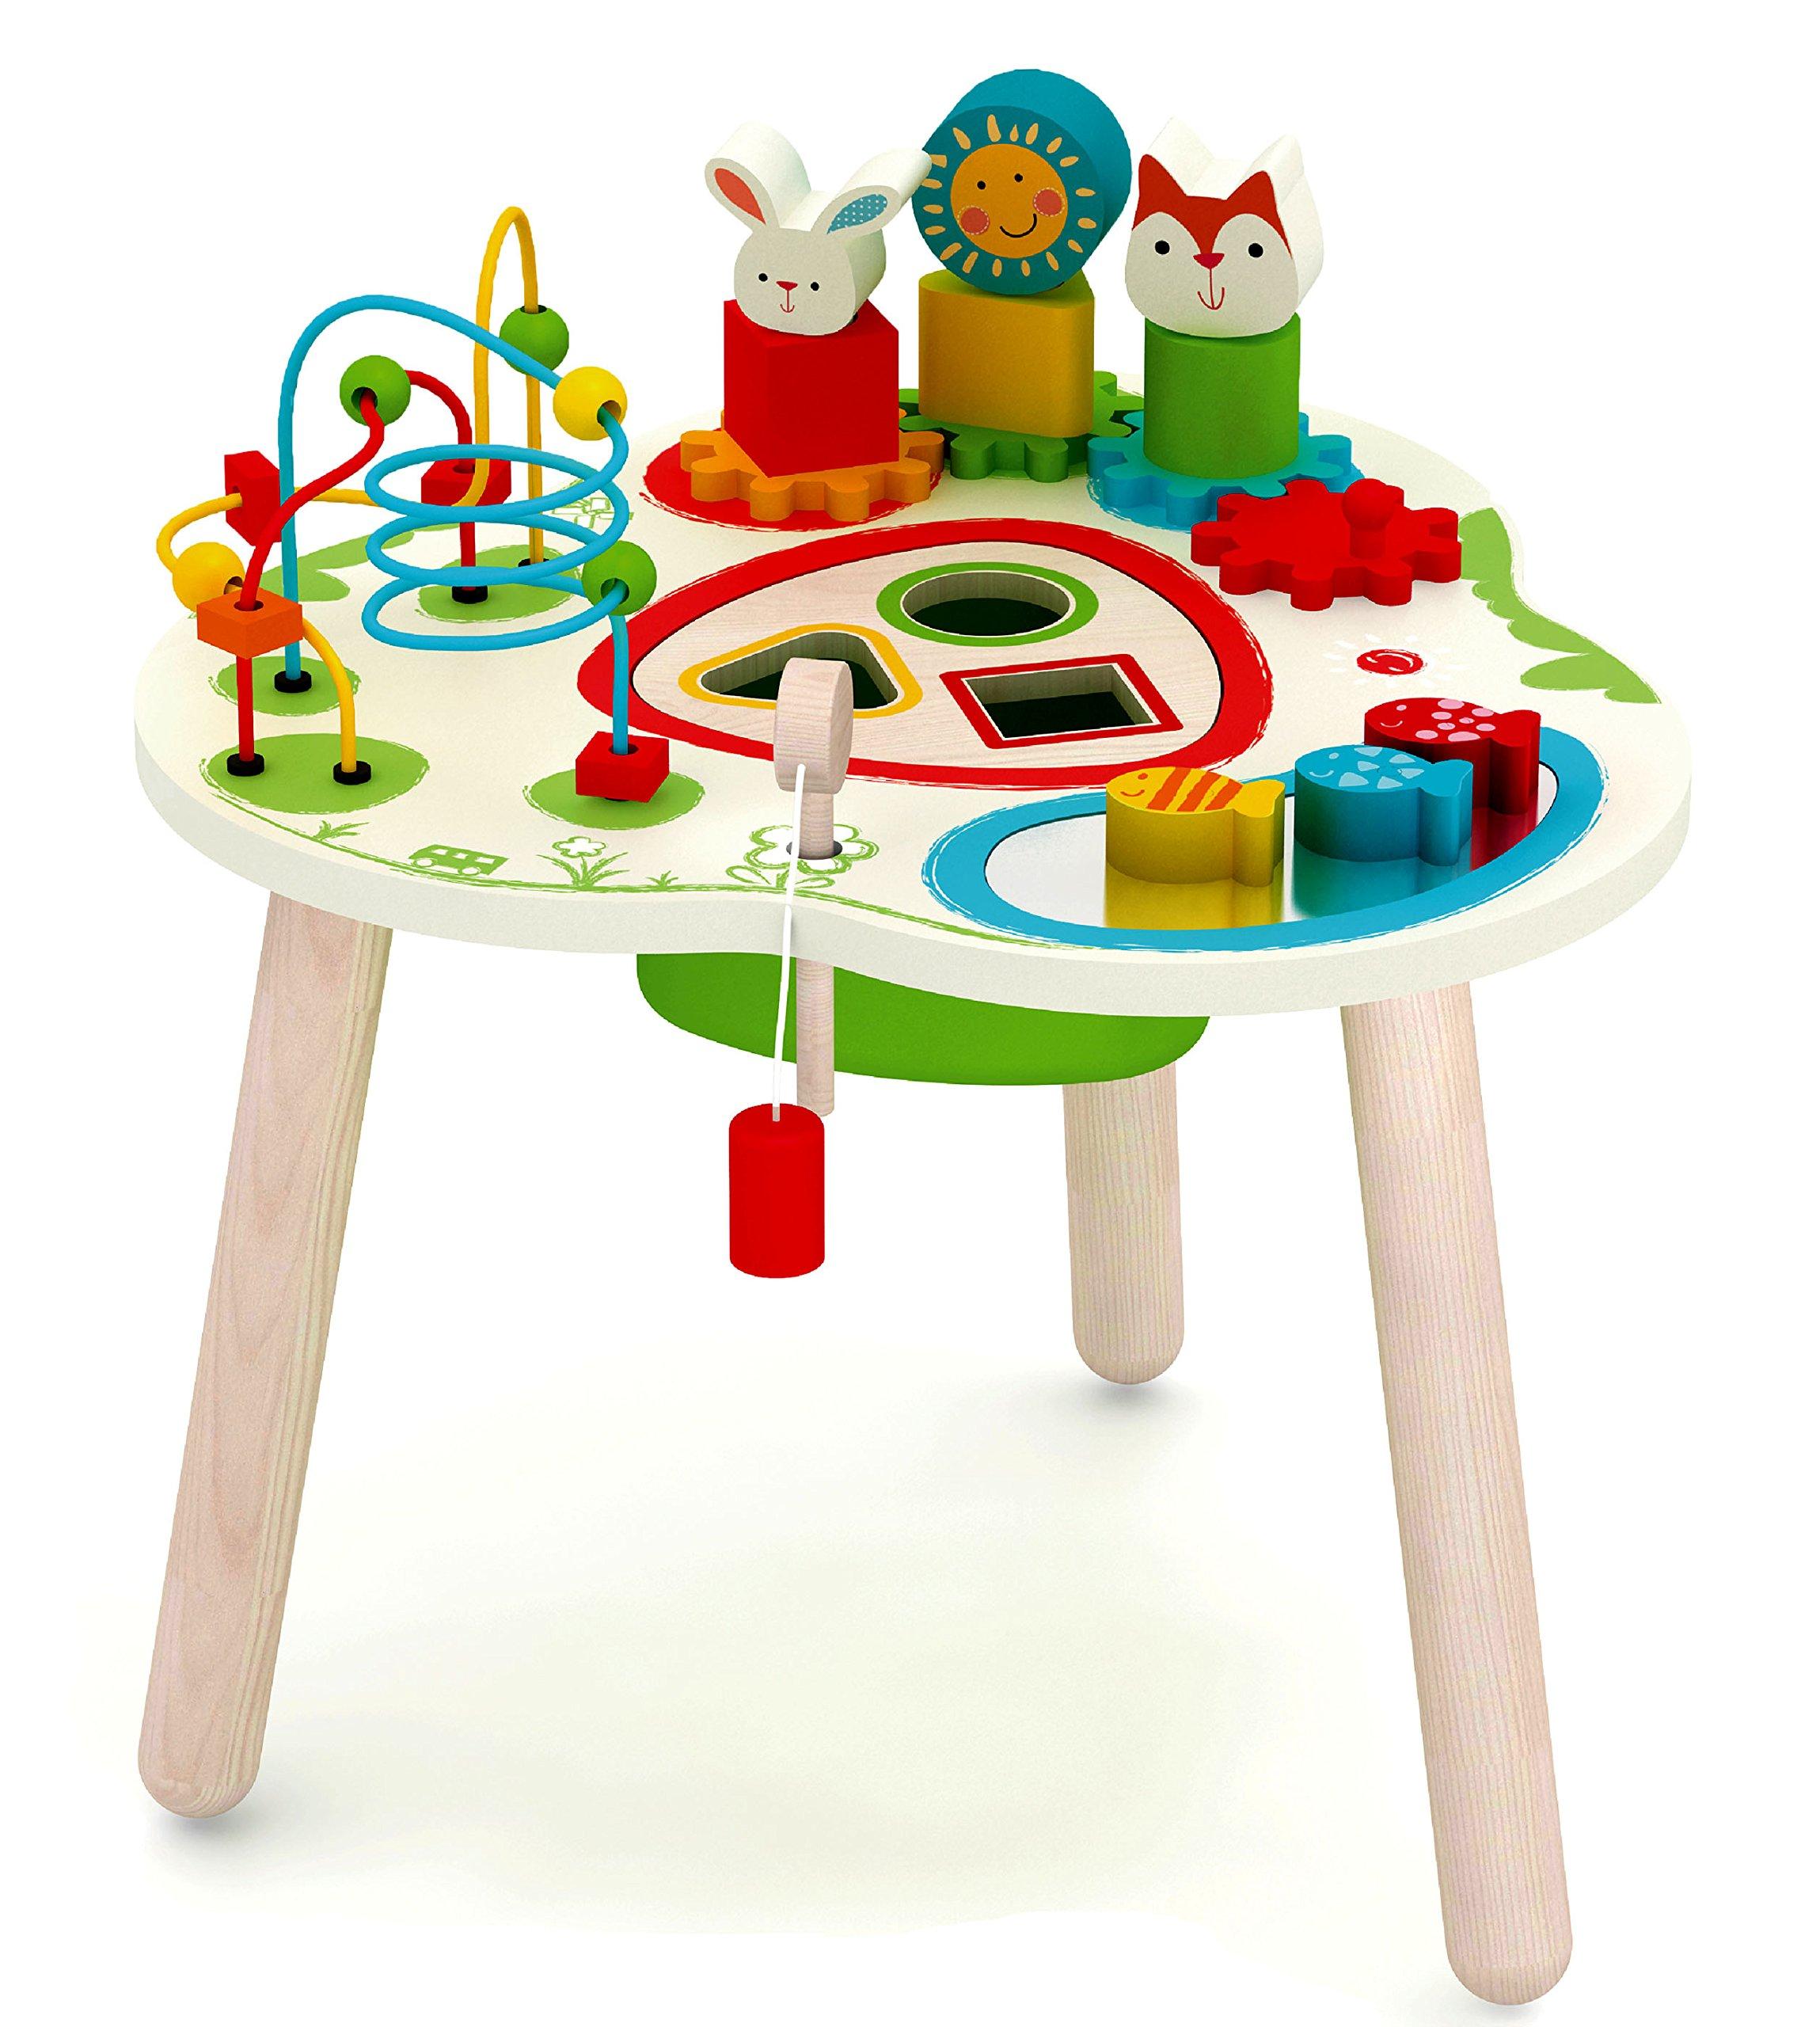 Wooden Adventure Table Activity Center